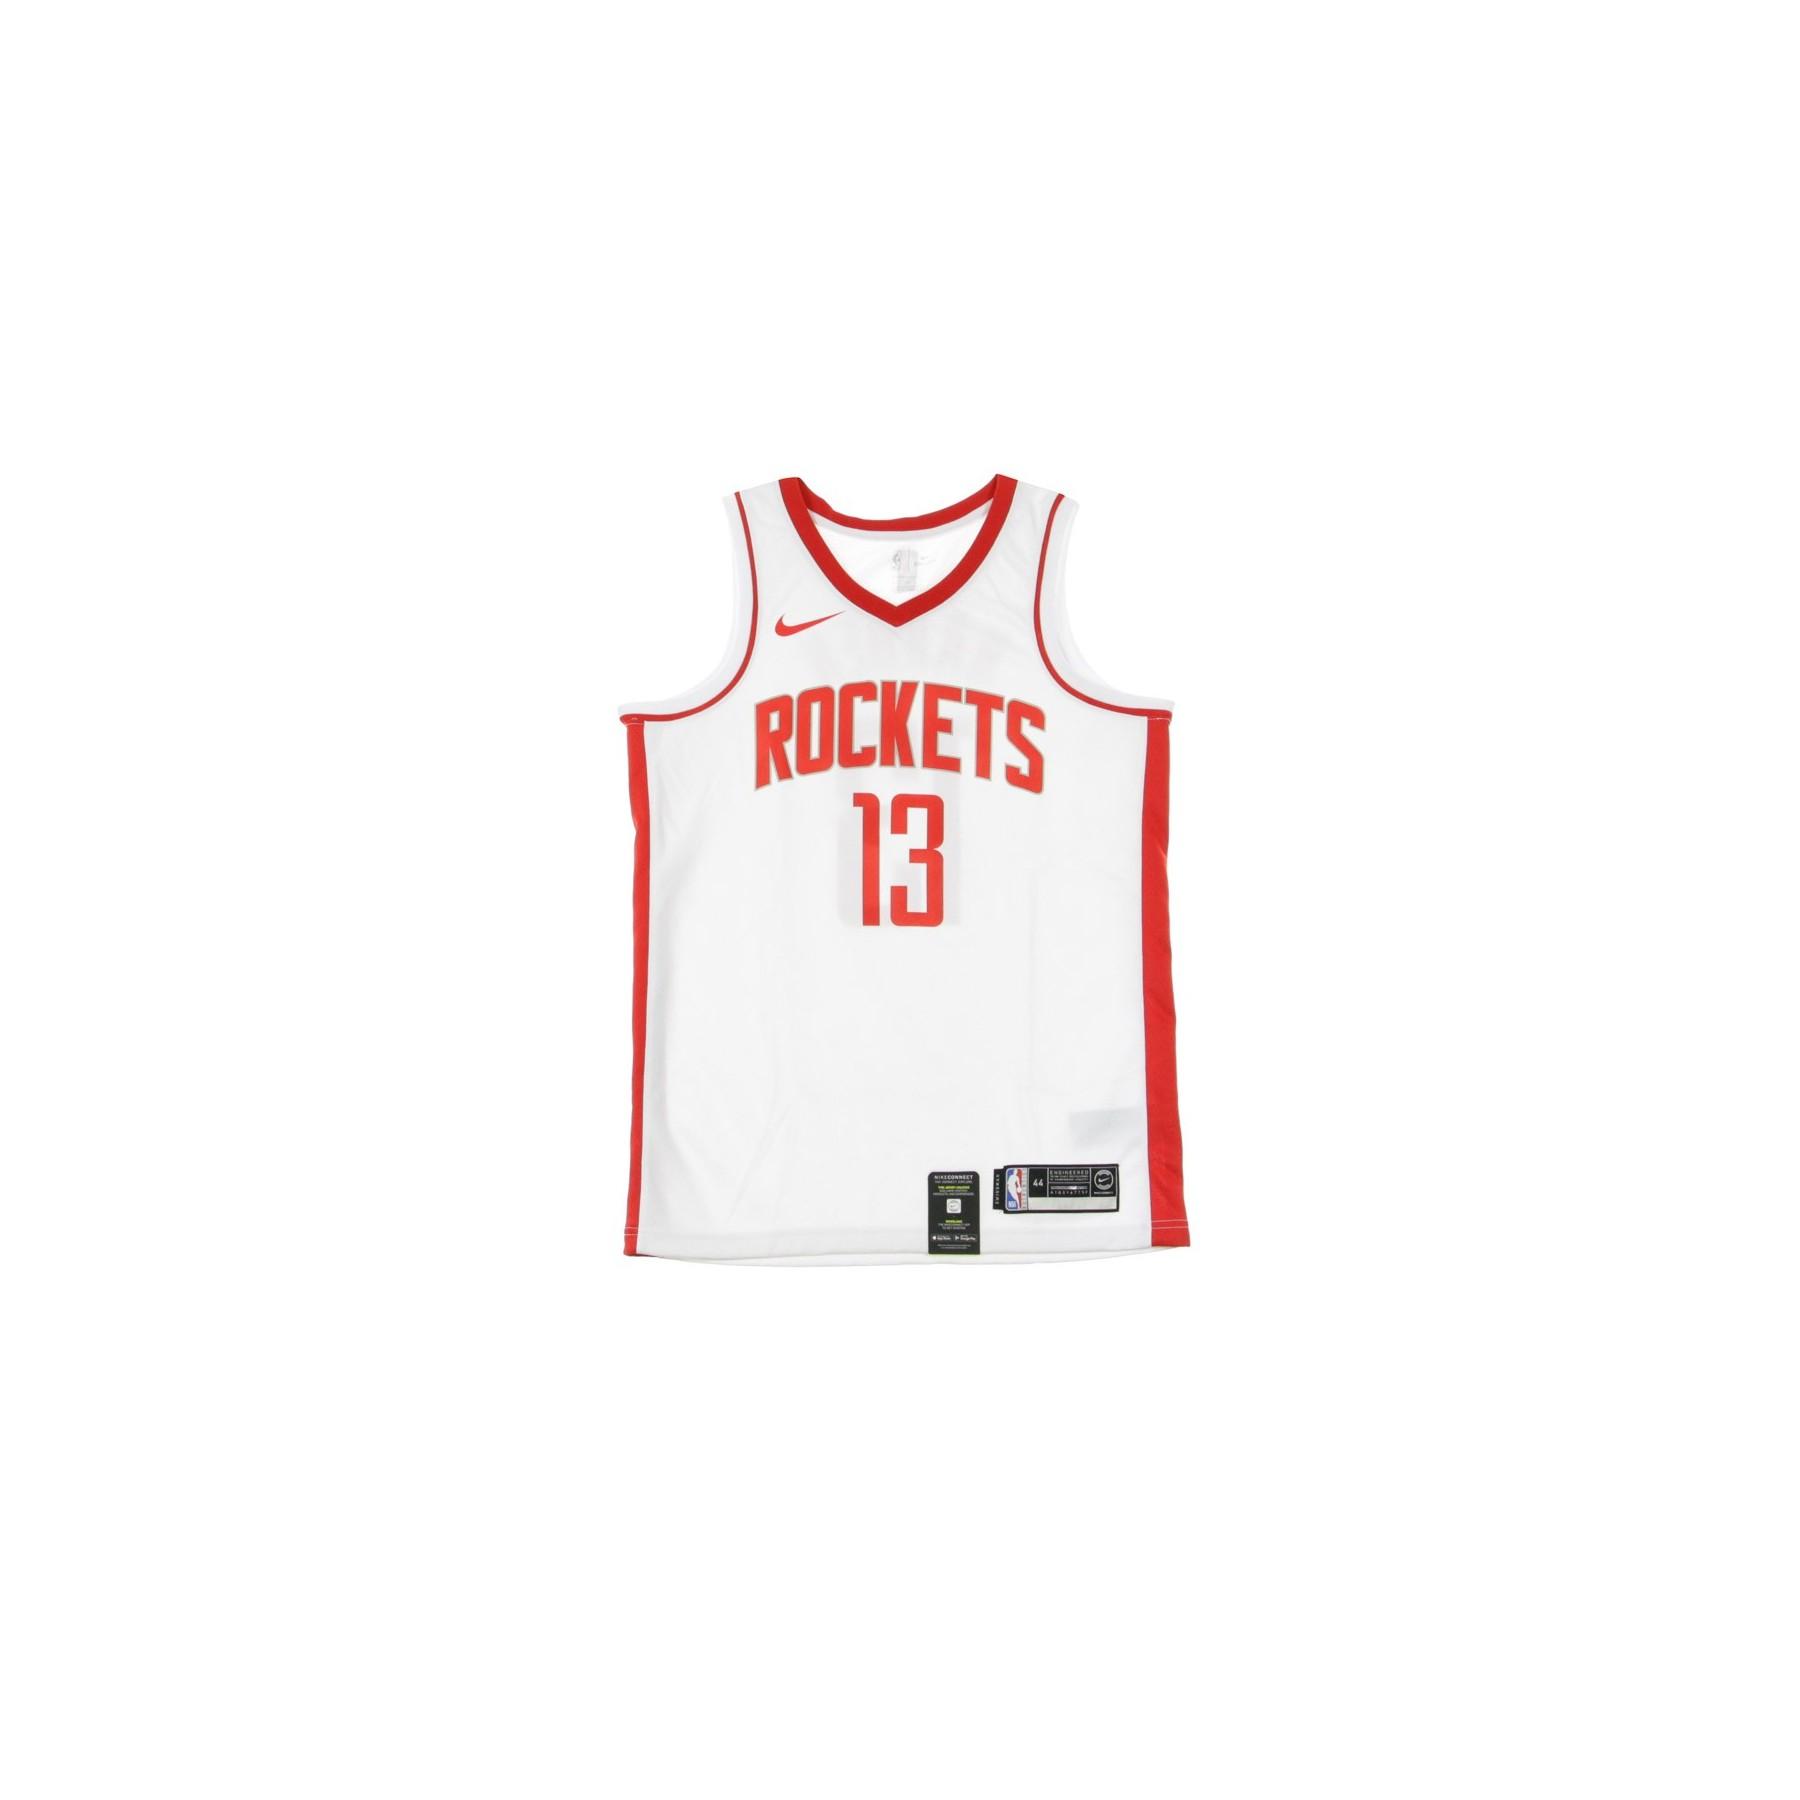 low priced b1230 7f407 CANOTTA BASKET NBA SWINGMAN JERSEY NO 13 JAMES HARDEN HOUROC HOME WHITE |  Atipicishop.com